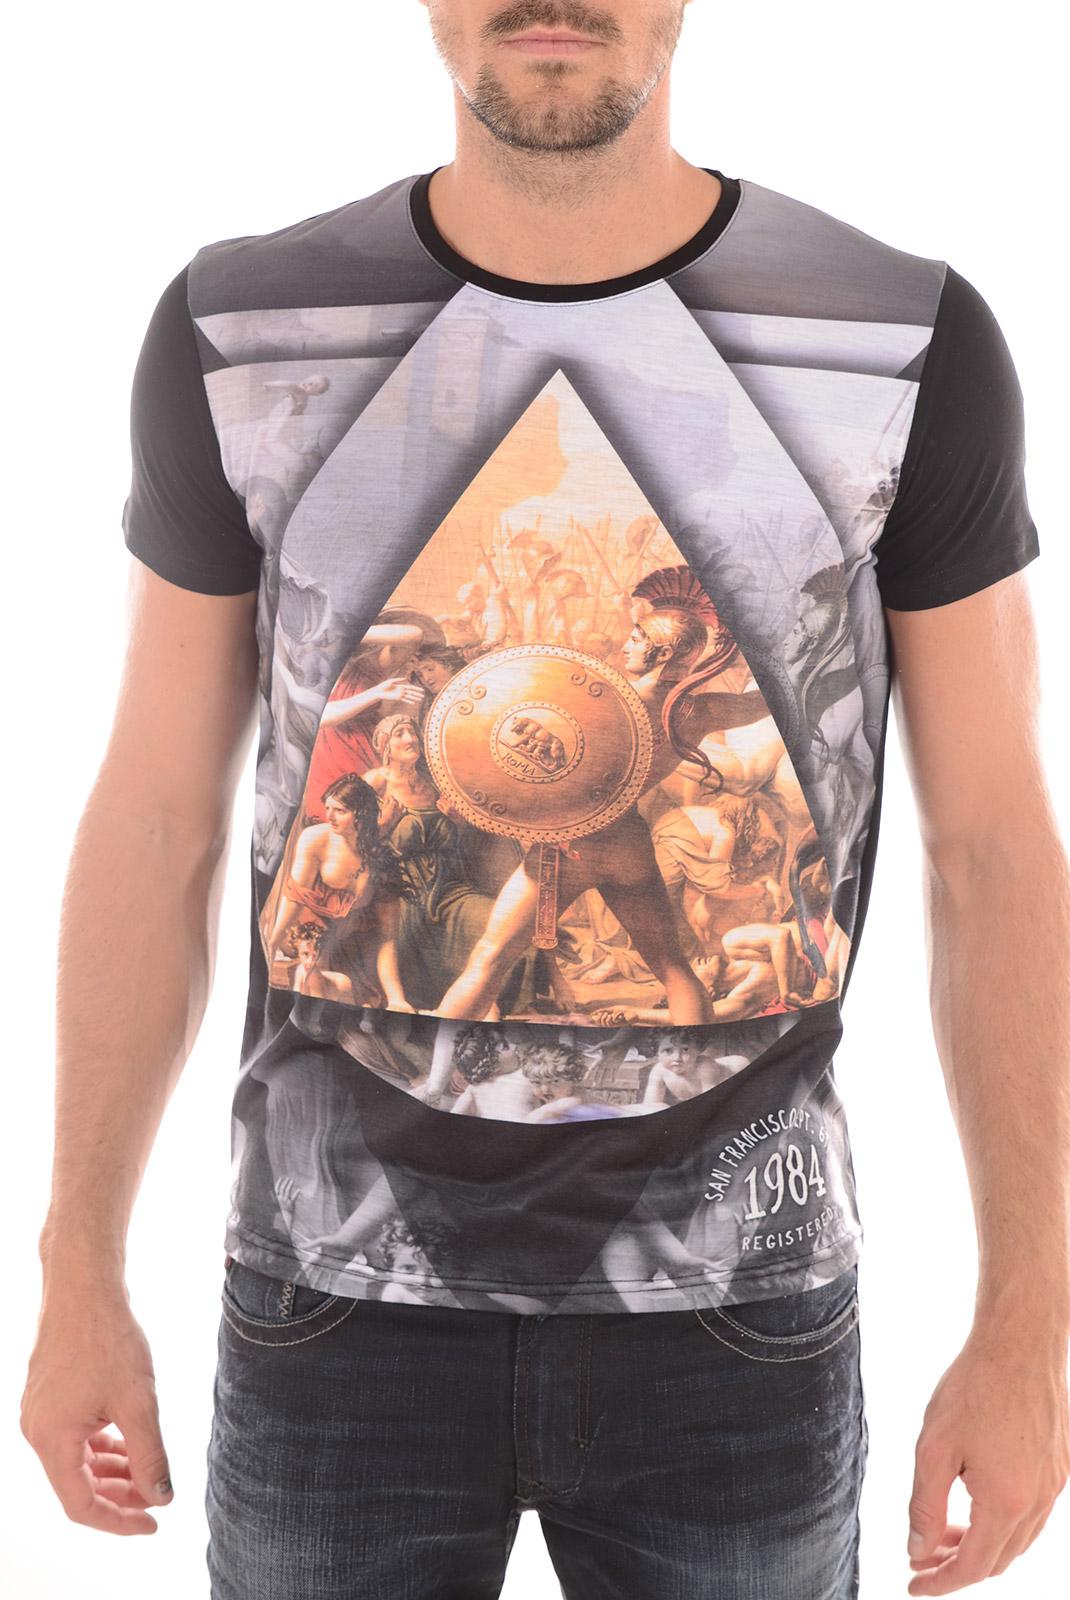 Tee-shirts  Redskins EDISON JETSET GLADIATOR